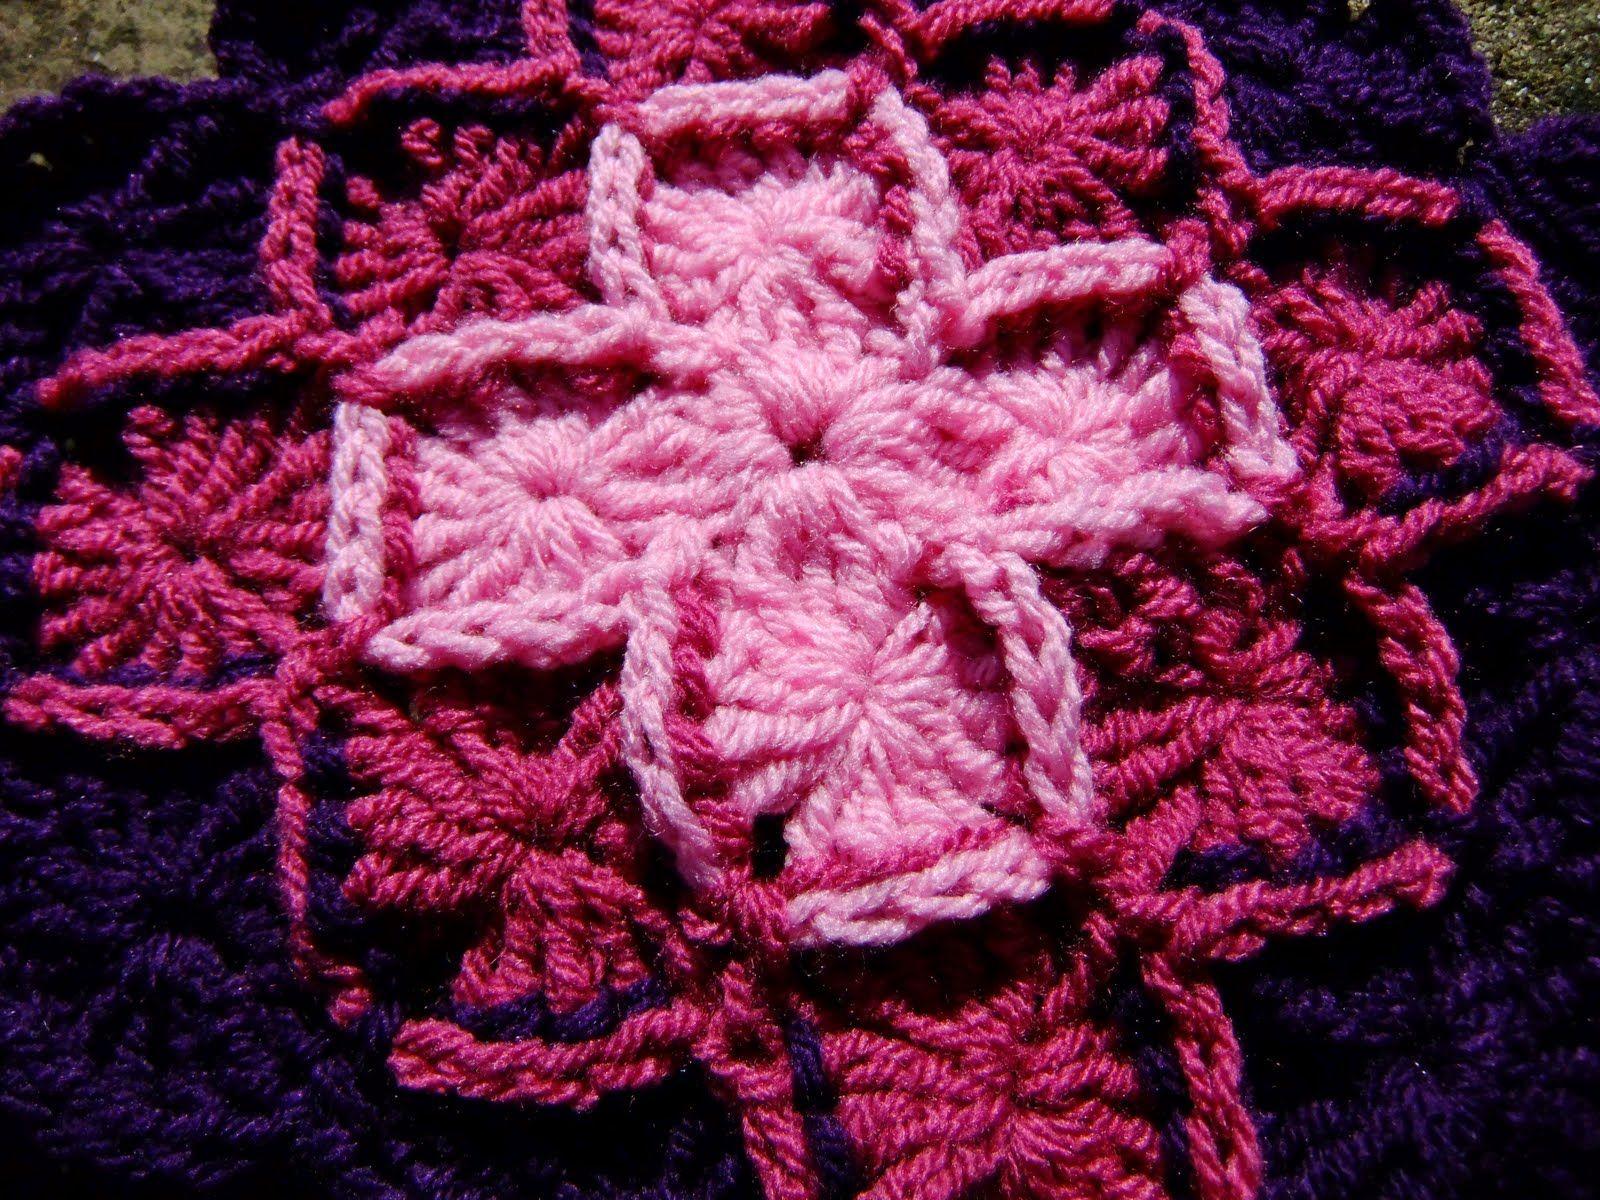 bavarian crochet | Camping, Granny Blanket and Bavarian Crochet ...